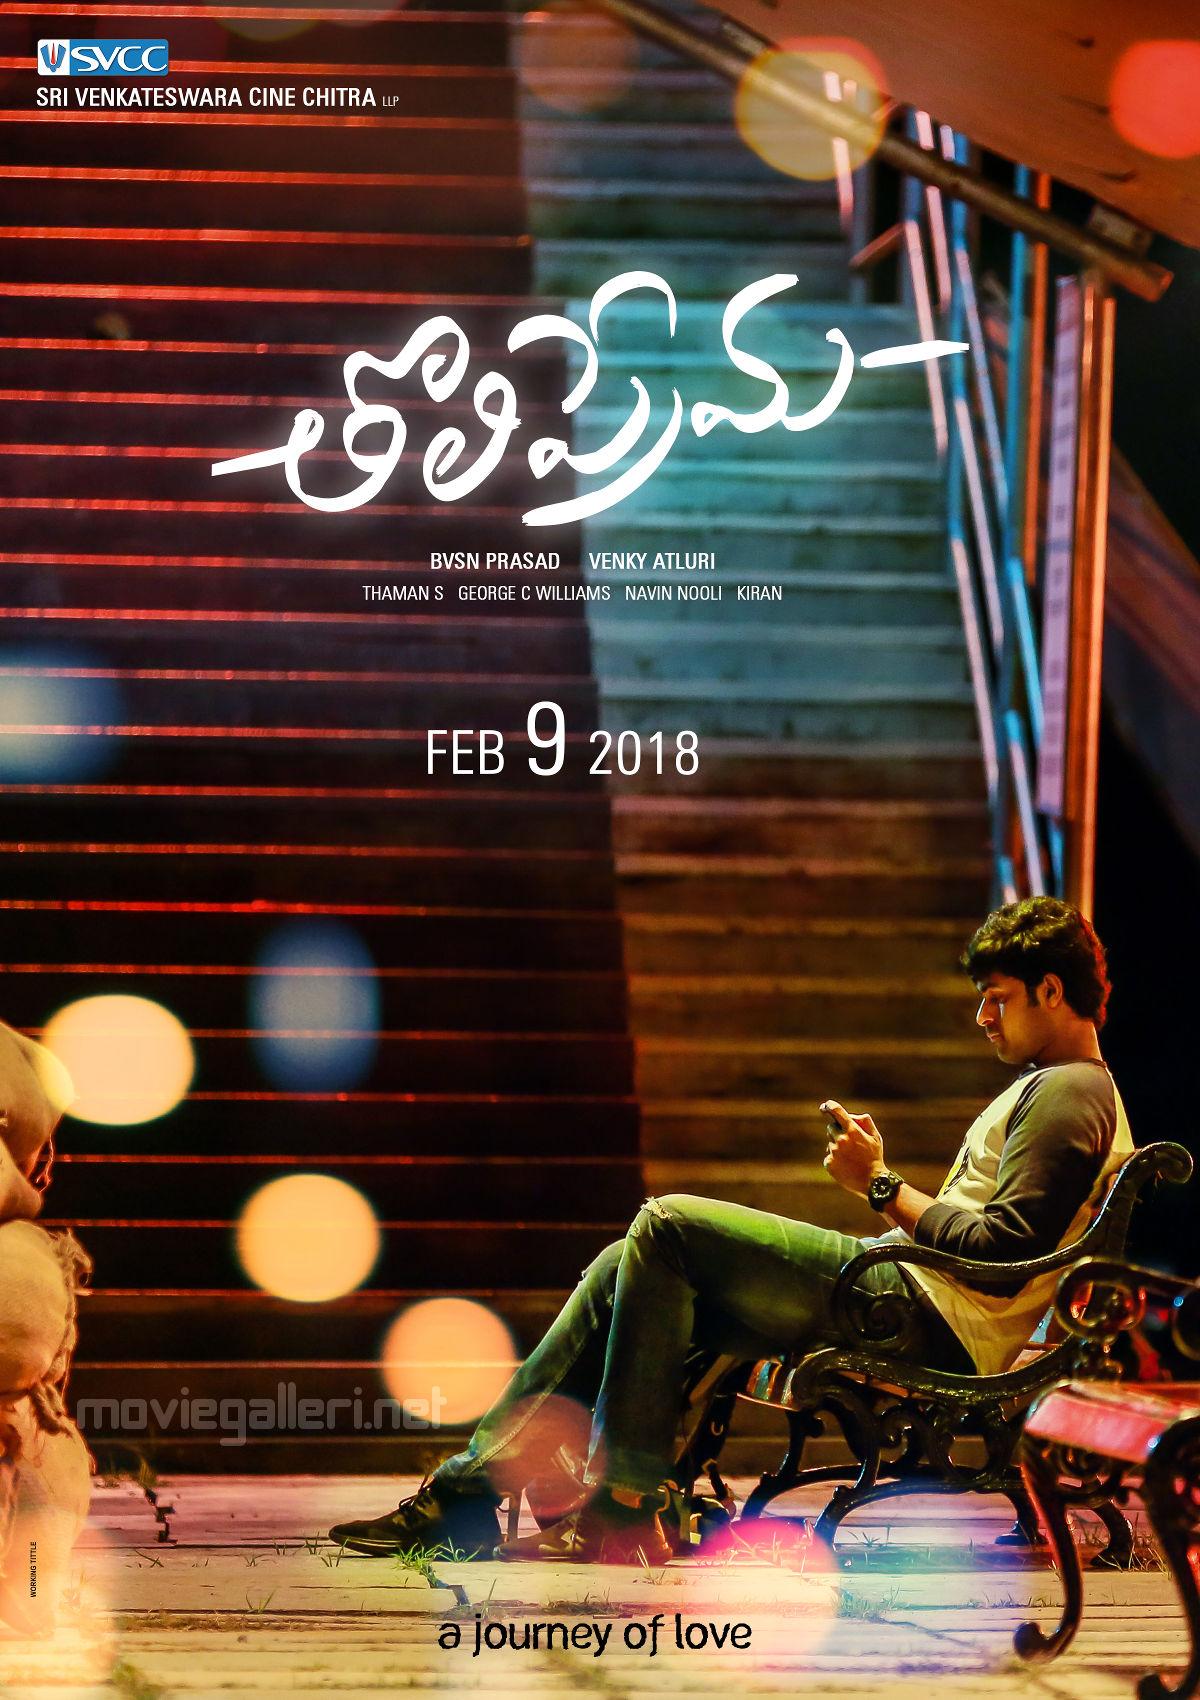 First look of Varun Tej's Toli Prema Poster